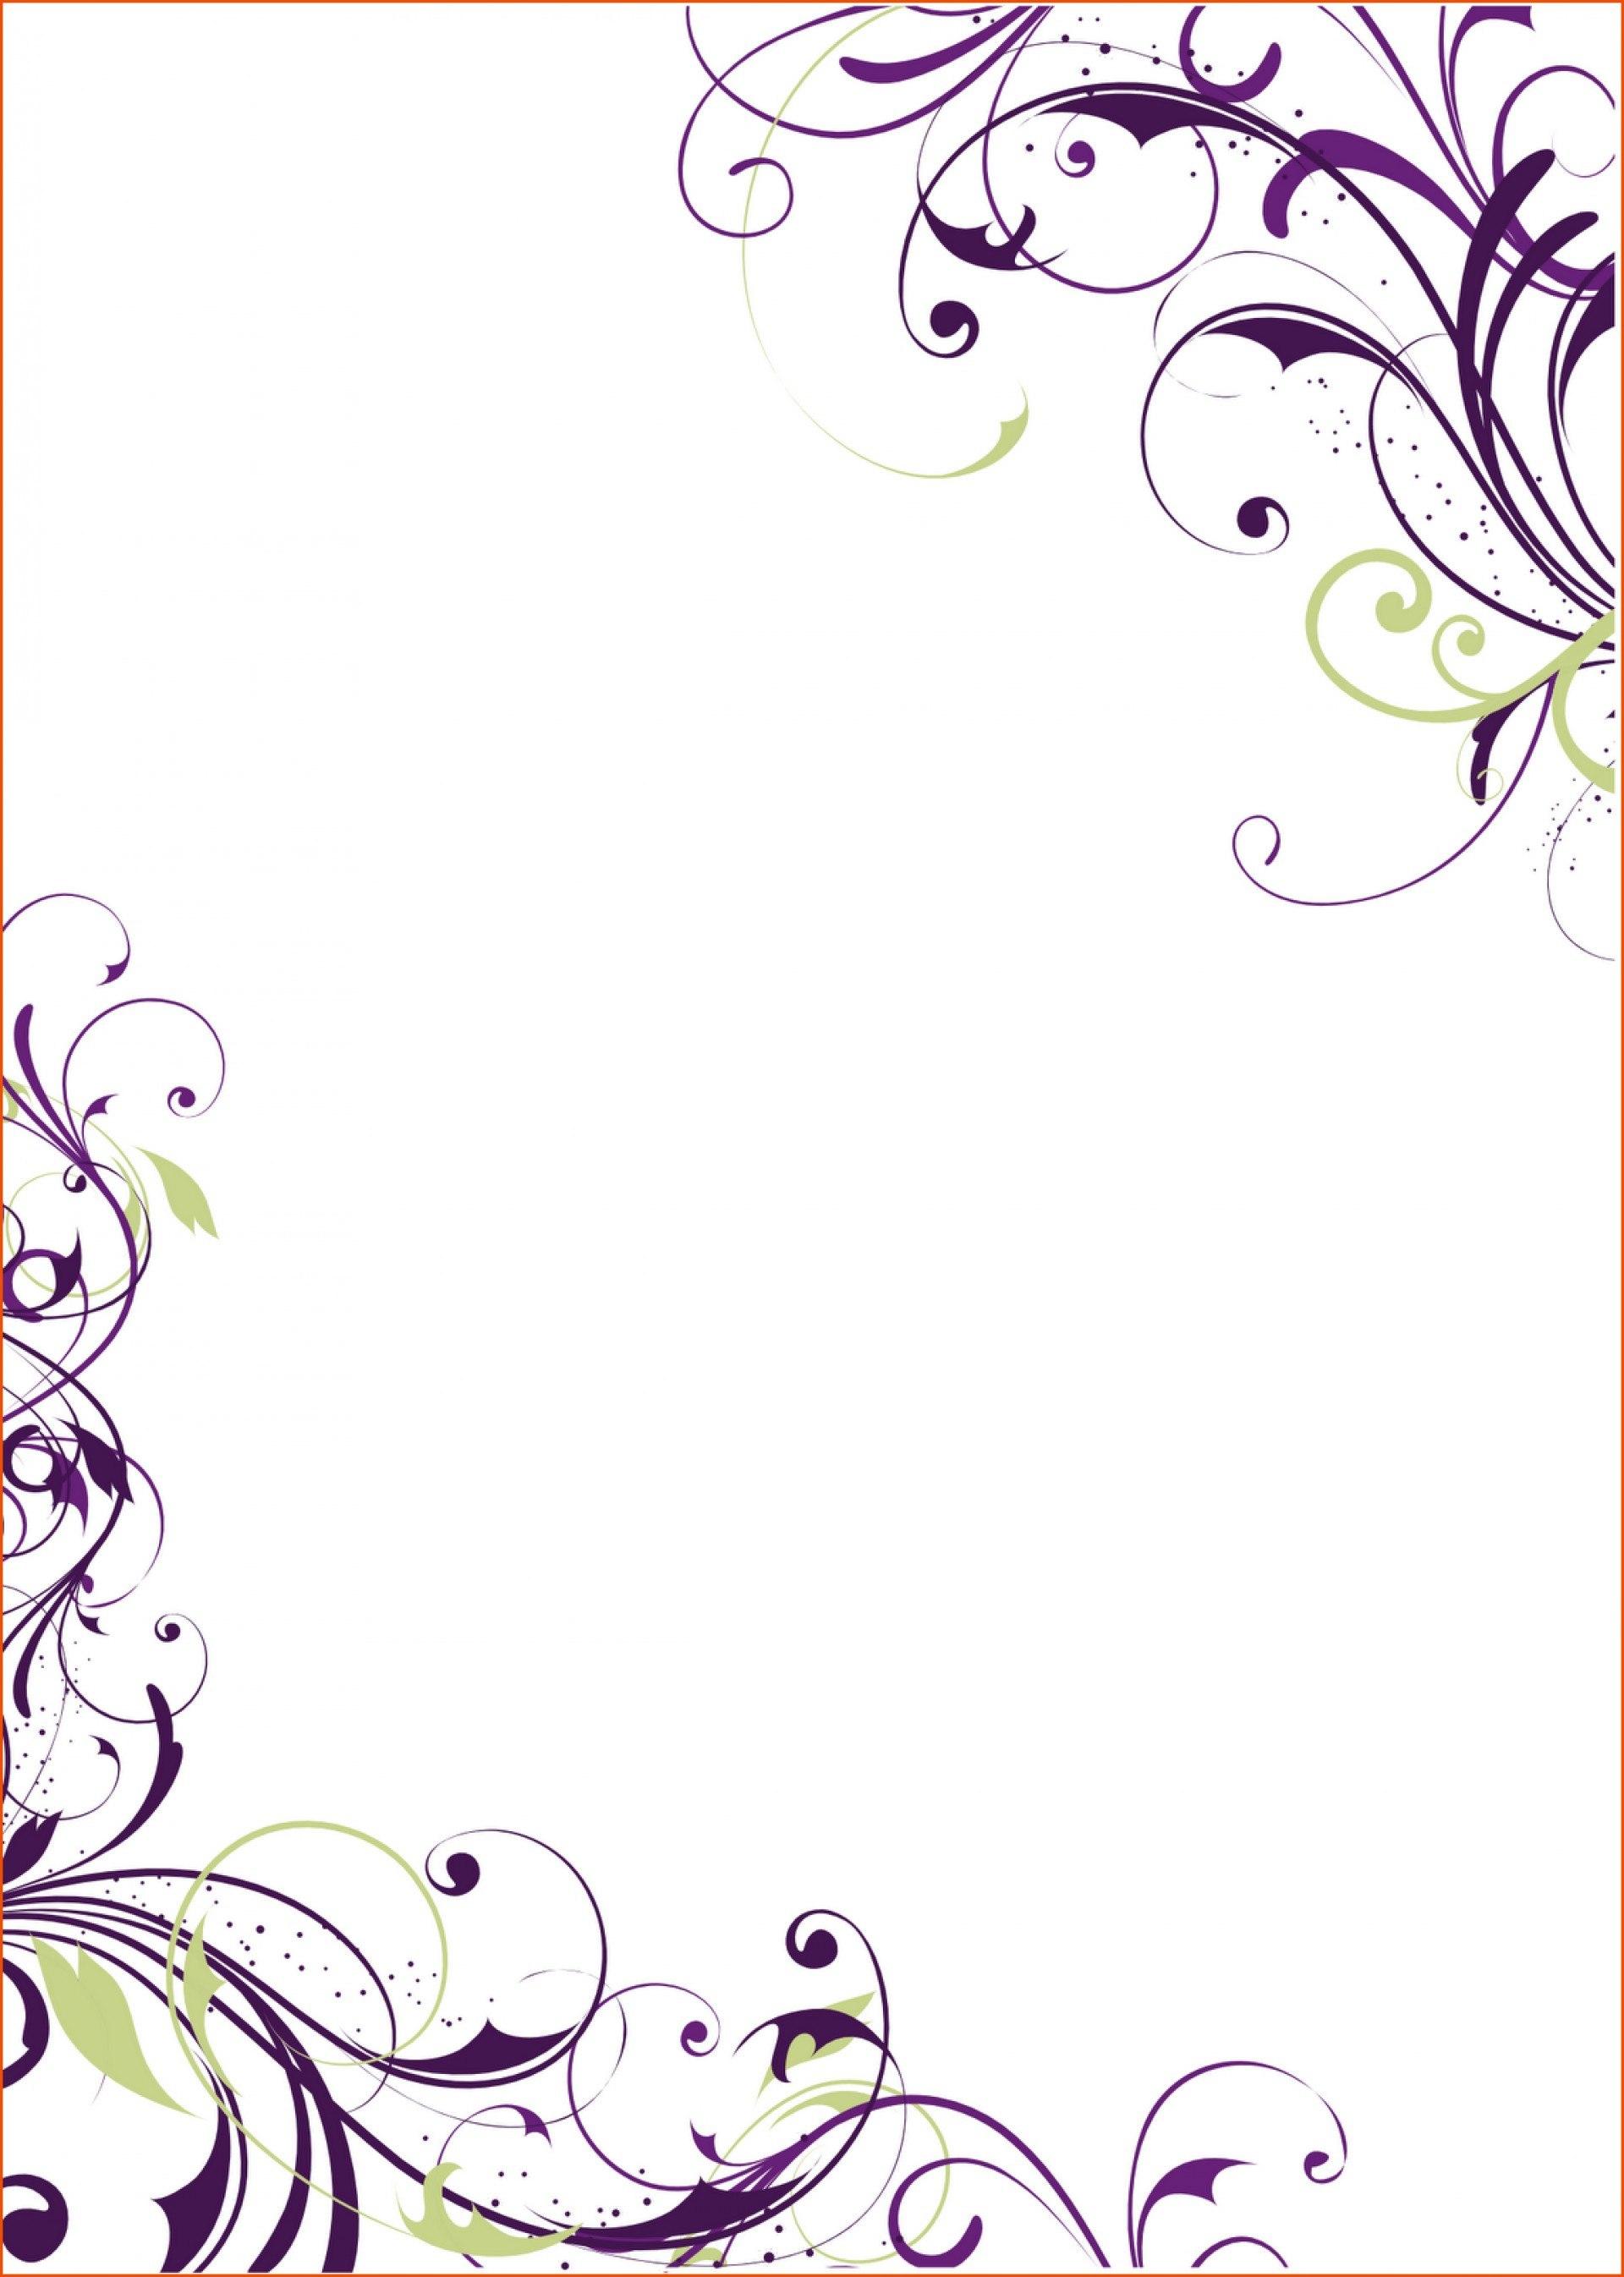 Stylish Bridal Shower Invitation Templates  Kittybabylove Within Blank Bridal Shower Invitations Templates